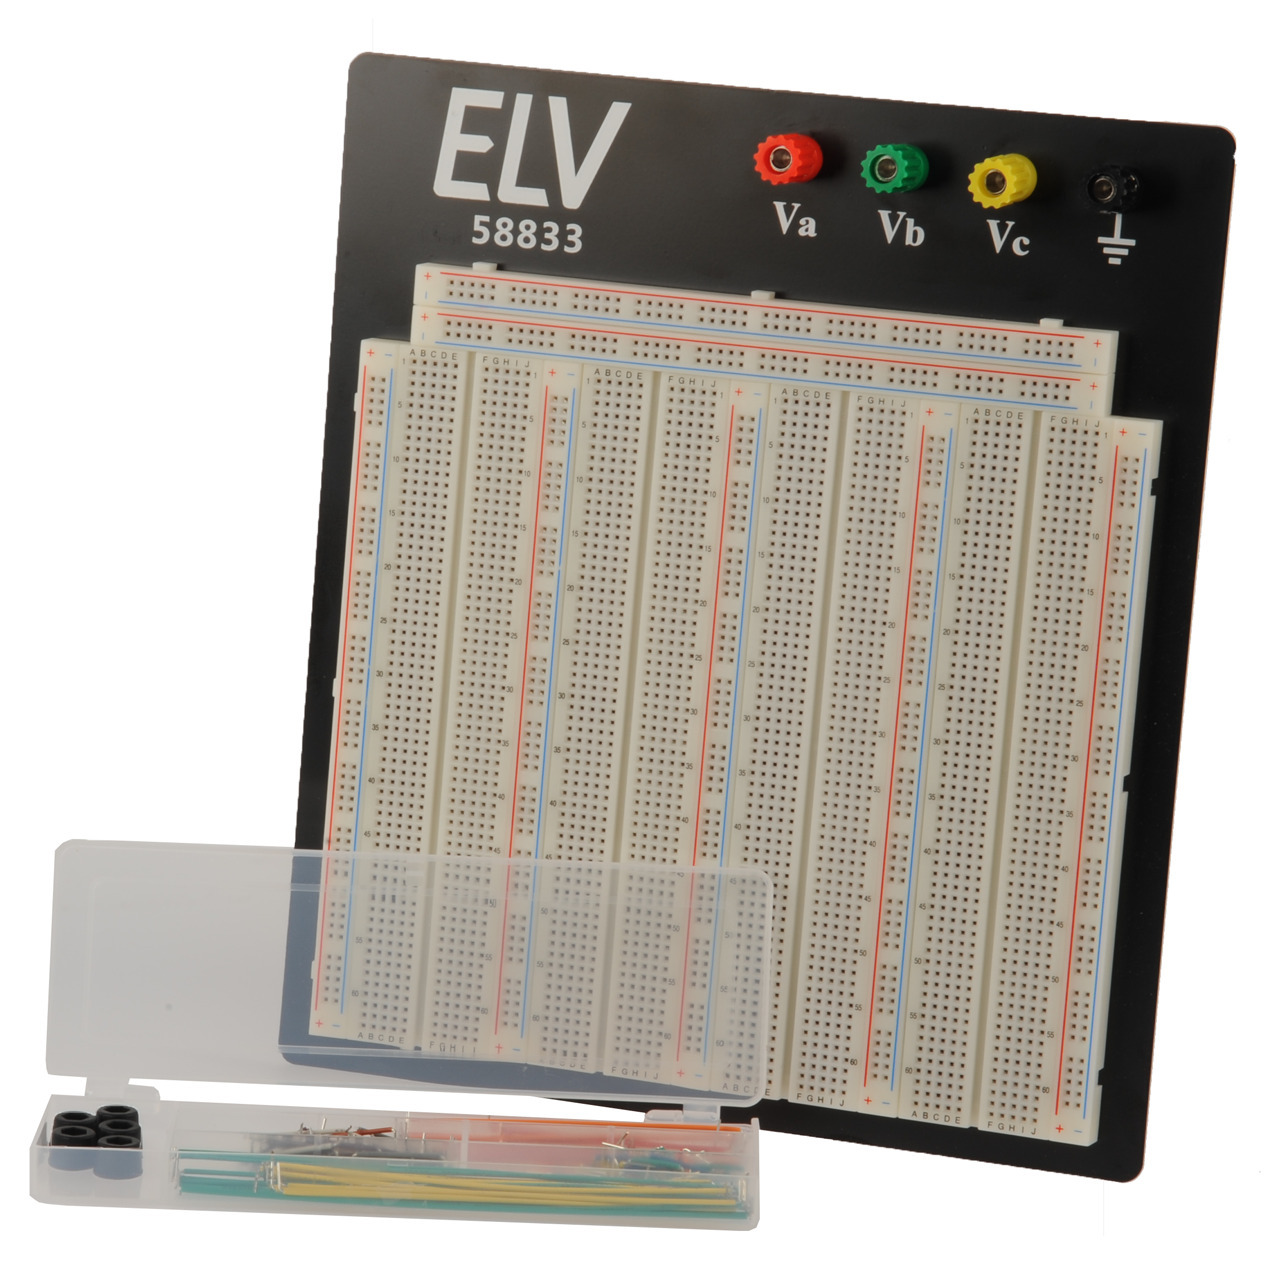 ELV Steckplatine-Breadboard 108 J- 3220 Kontakte- inkl- 140-teiligem Drahtbrücken-Set